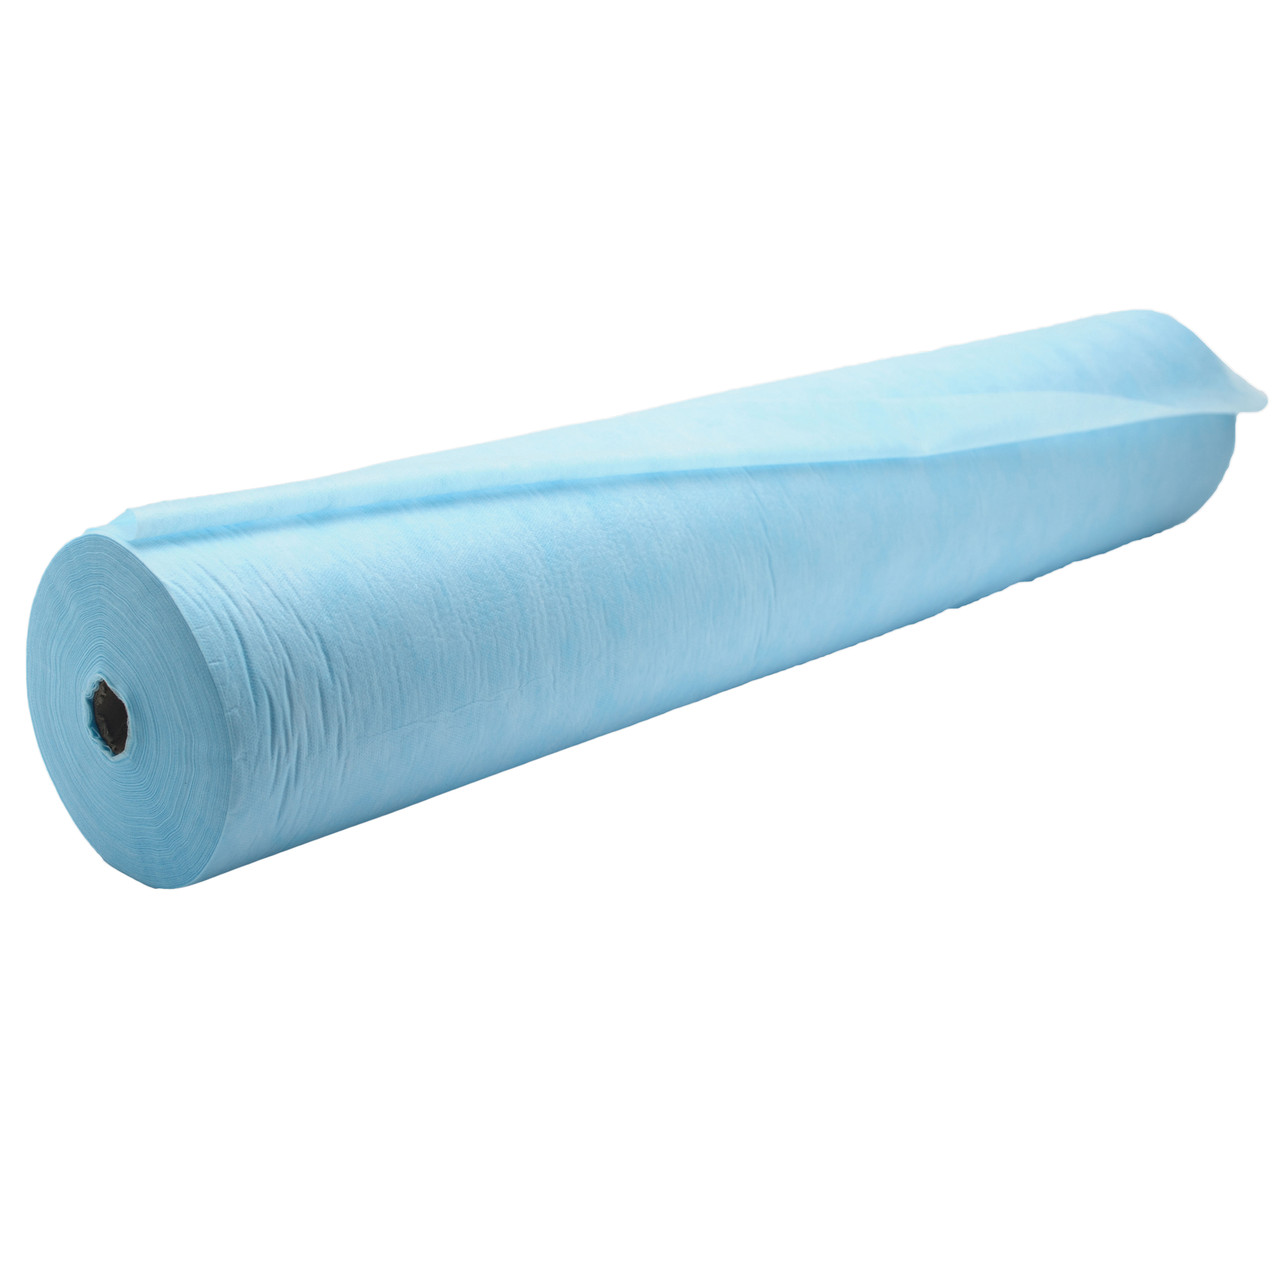 Простынь одноразовая голубая 23 гр/м 0,6 х 100 м.